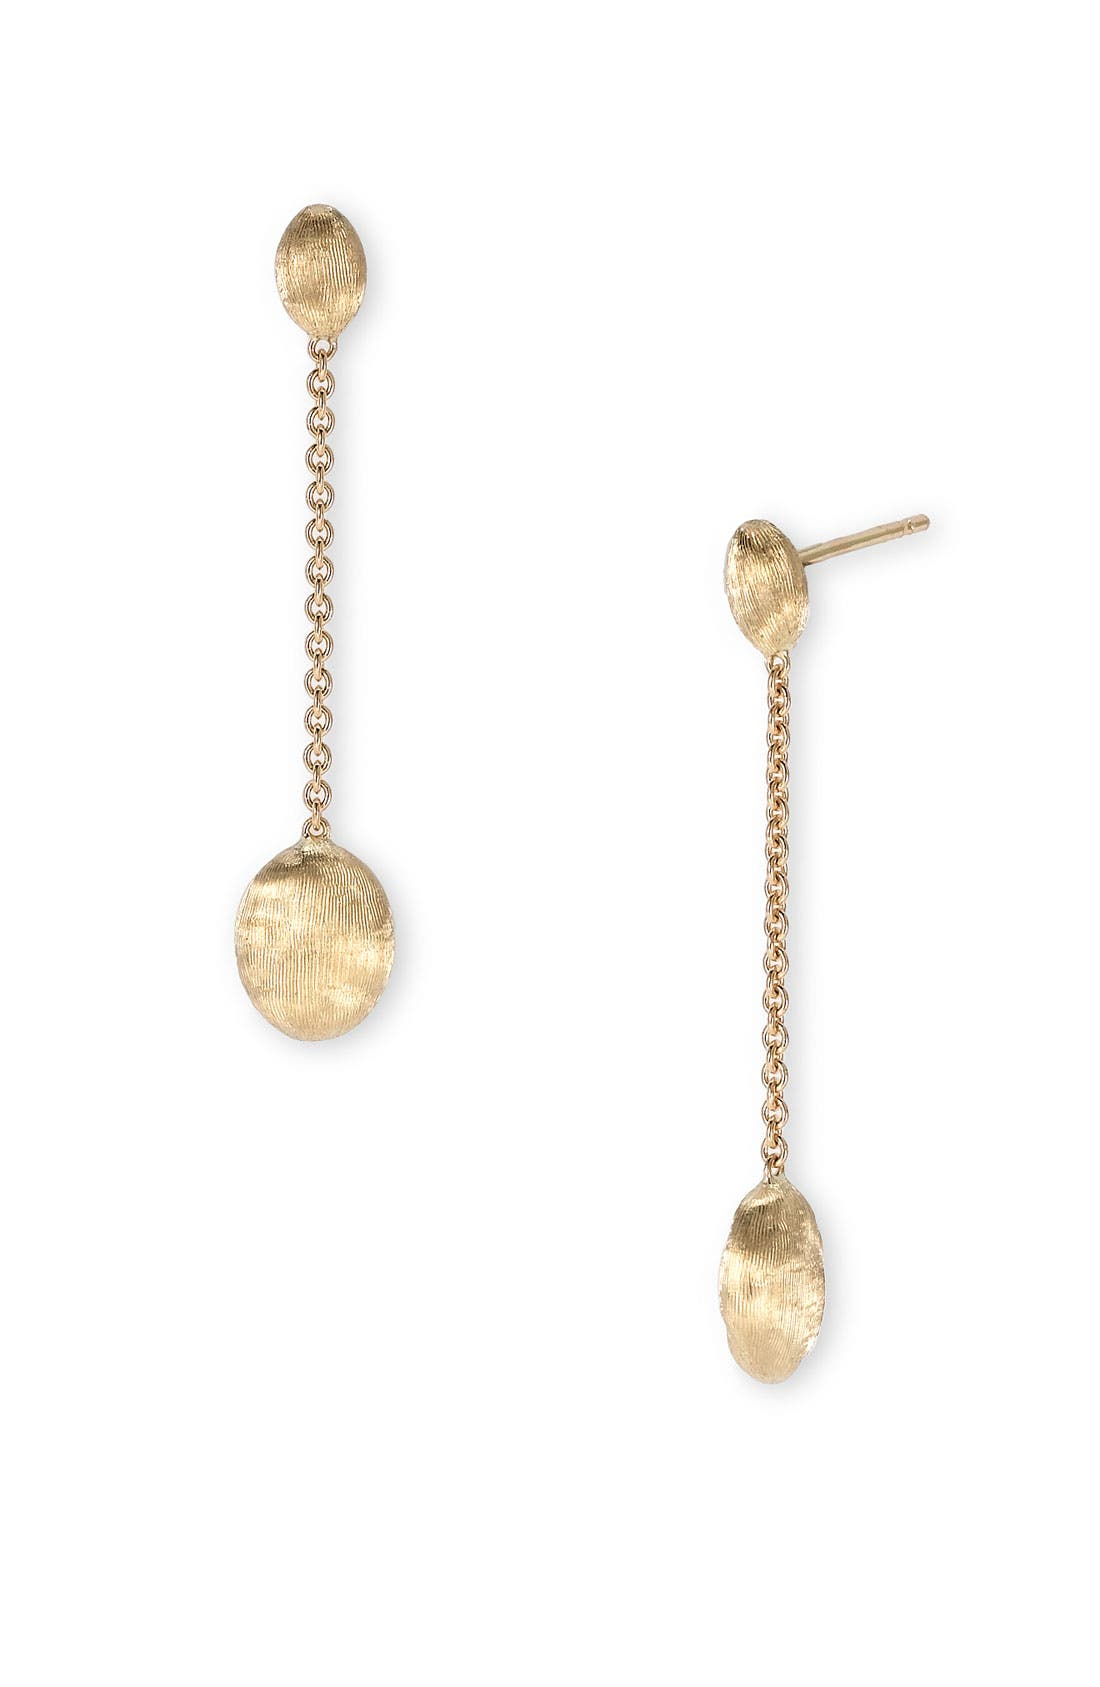 Main Image - Marco Bicego 'Siviglia' Linear Earrings